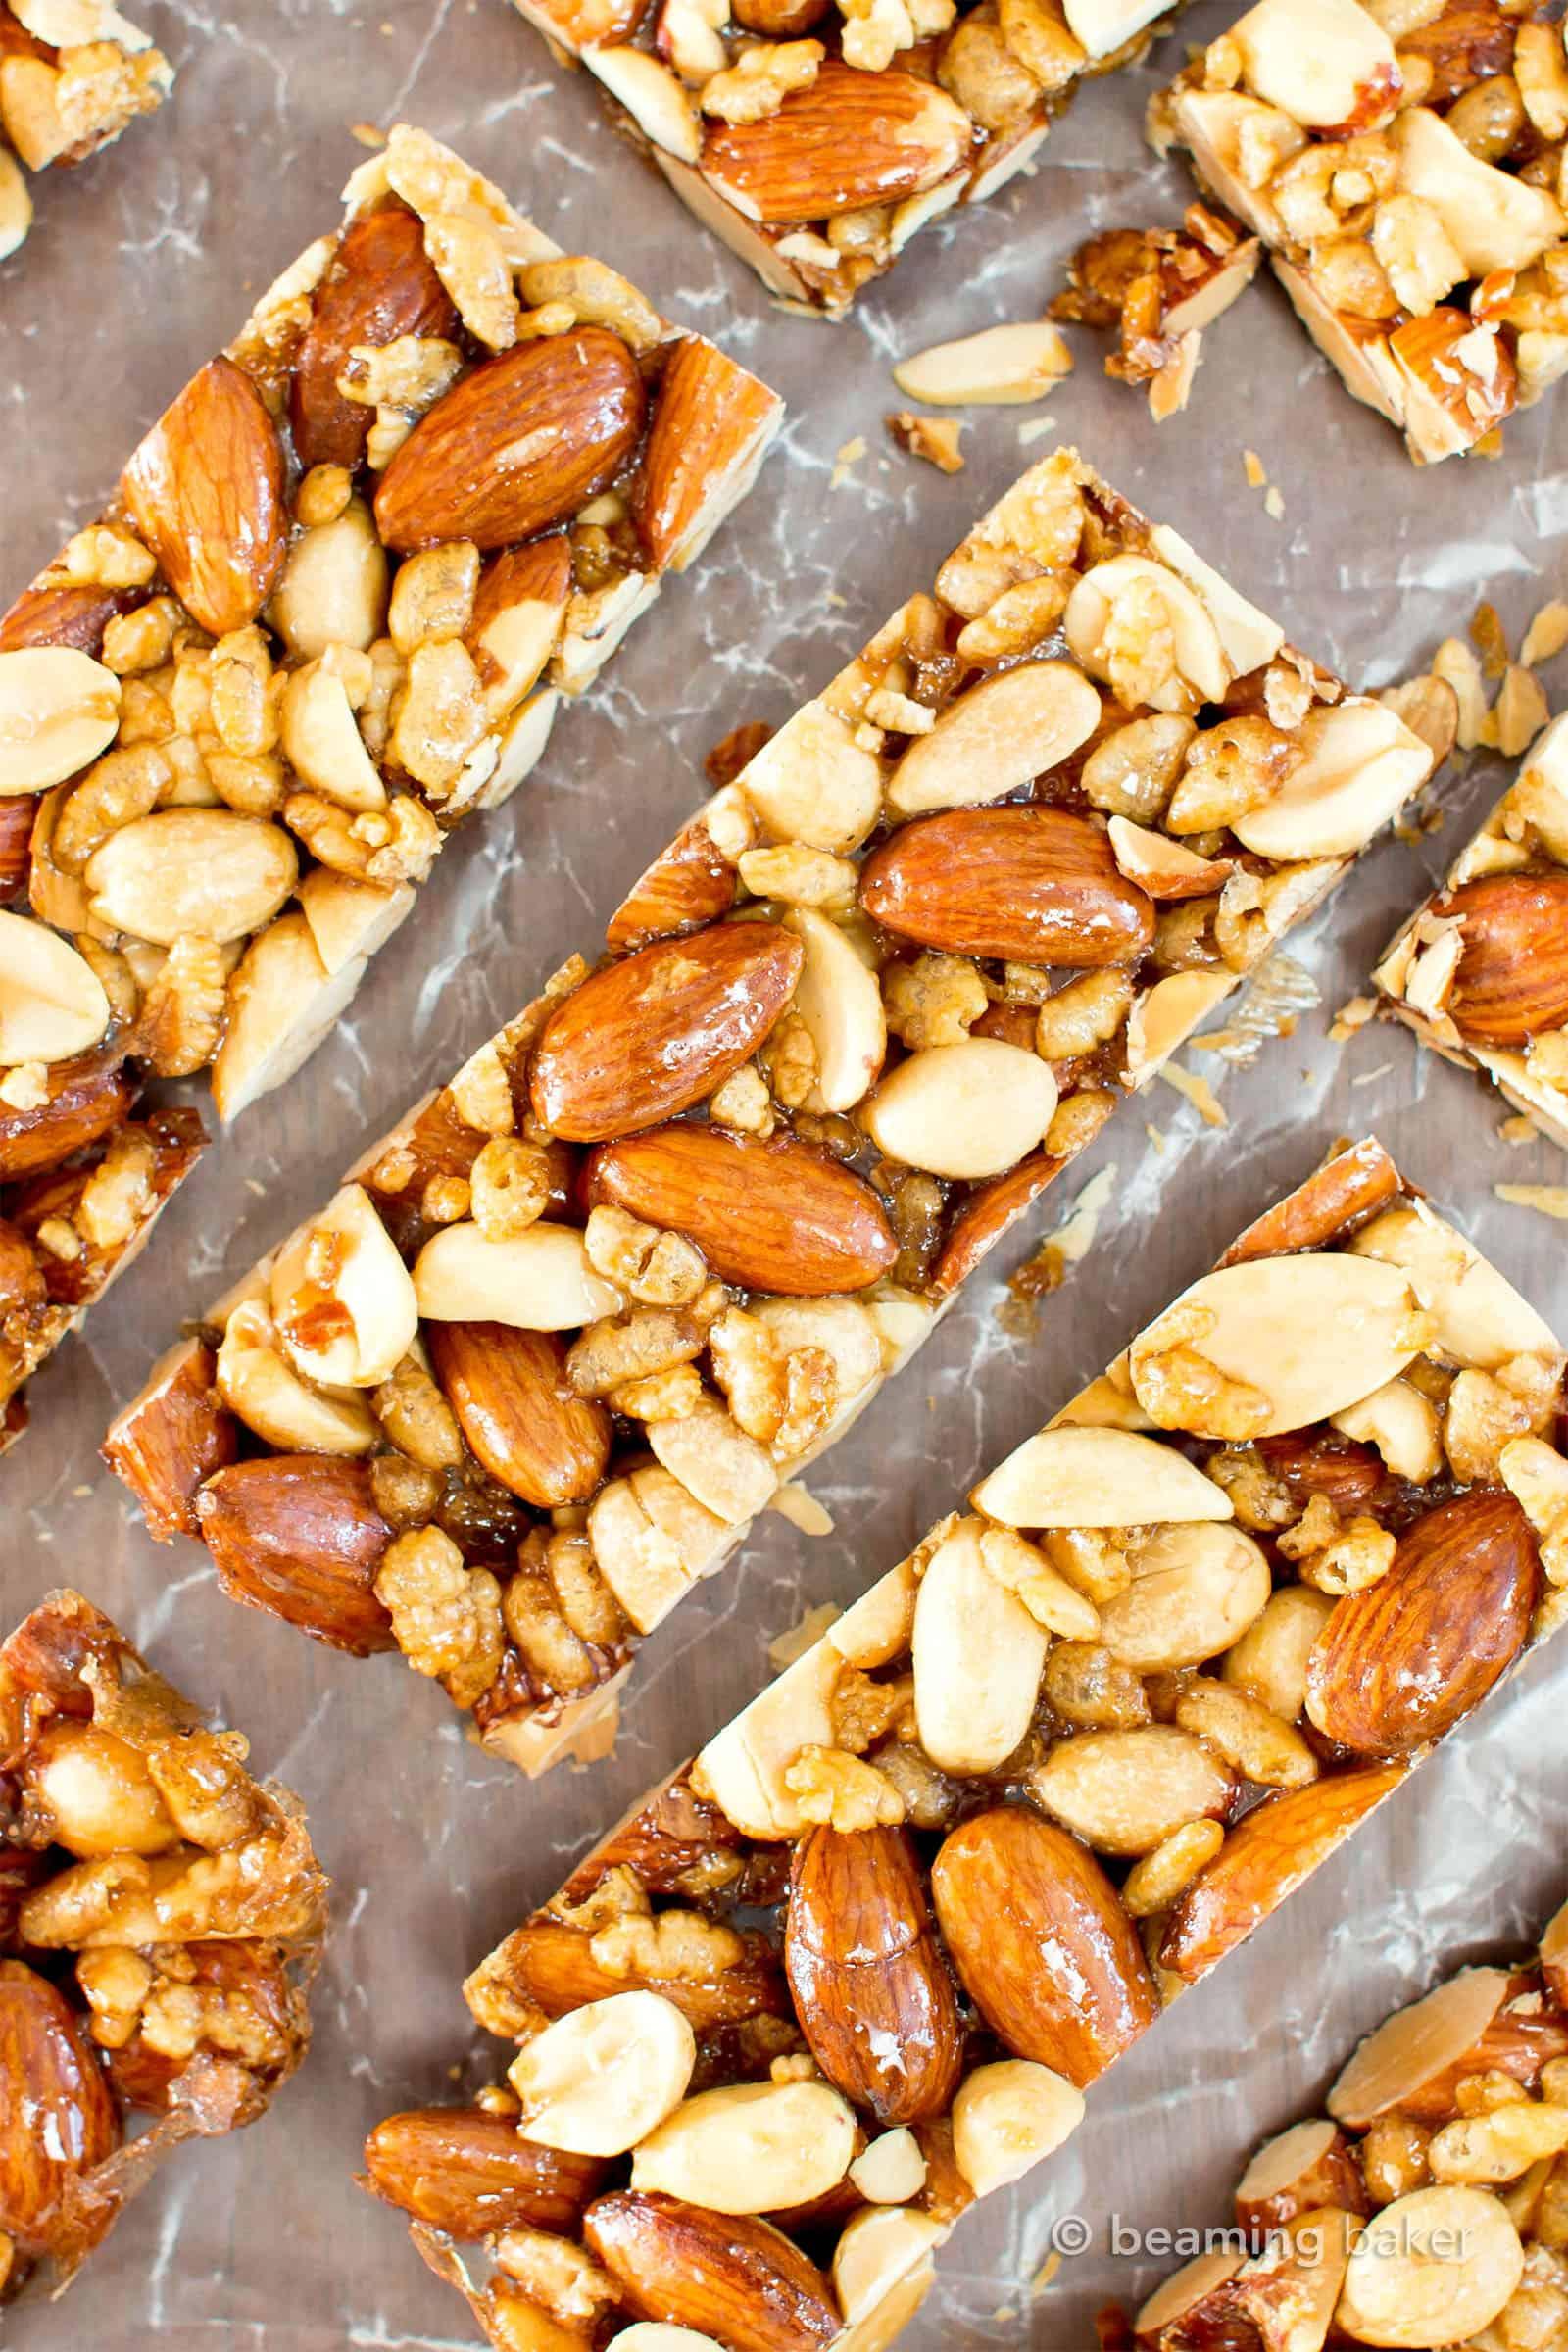 Homemade KIND Bars: an easy, 5 ingredient nut bars recipe for homemade kind bars! Salty 'n sweet healthy nut bar delight! #NutBars #KIND #Homemade #Recipe | Recipe at BeamingBaker.com